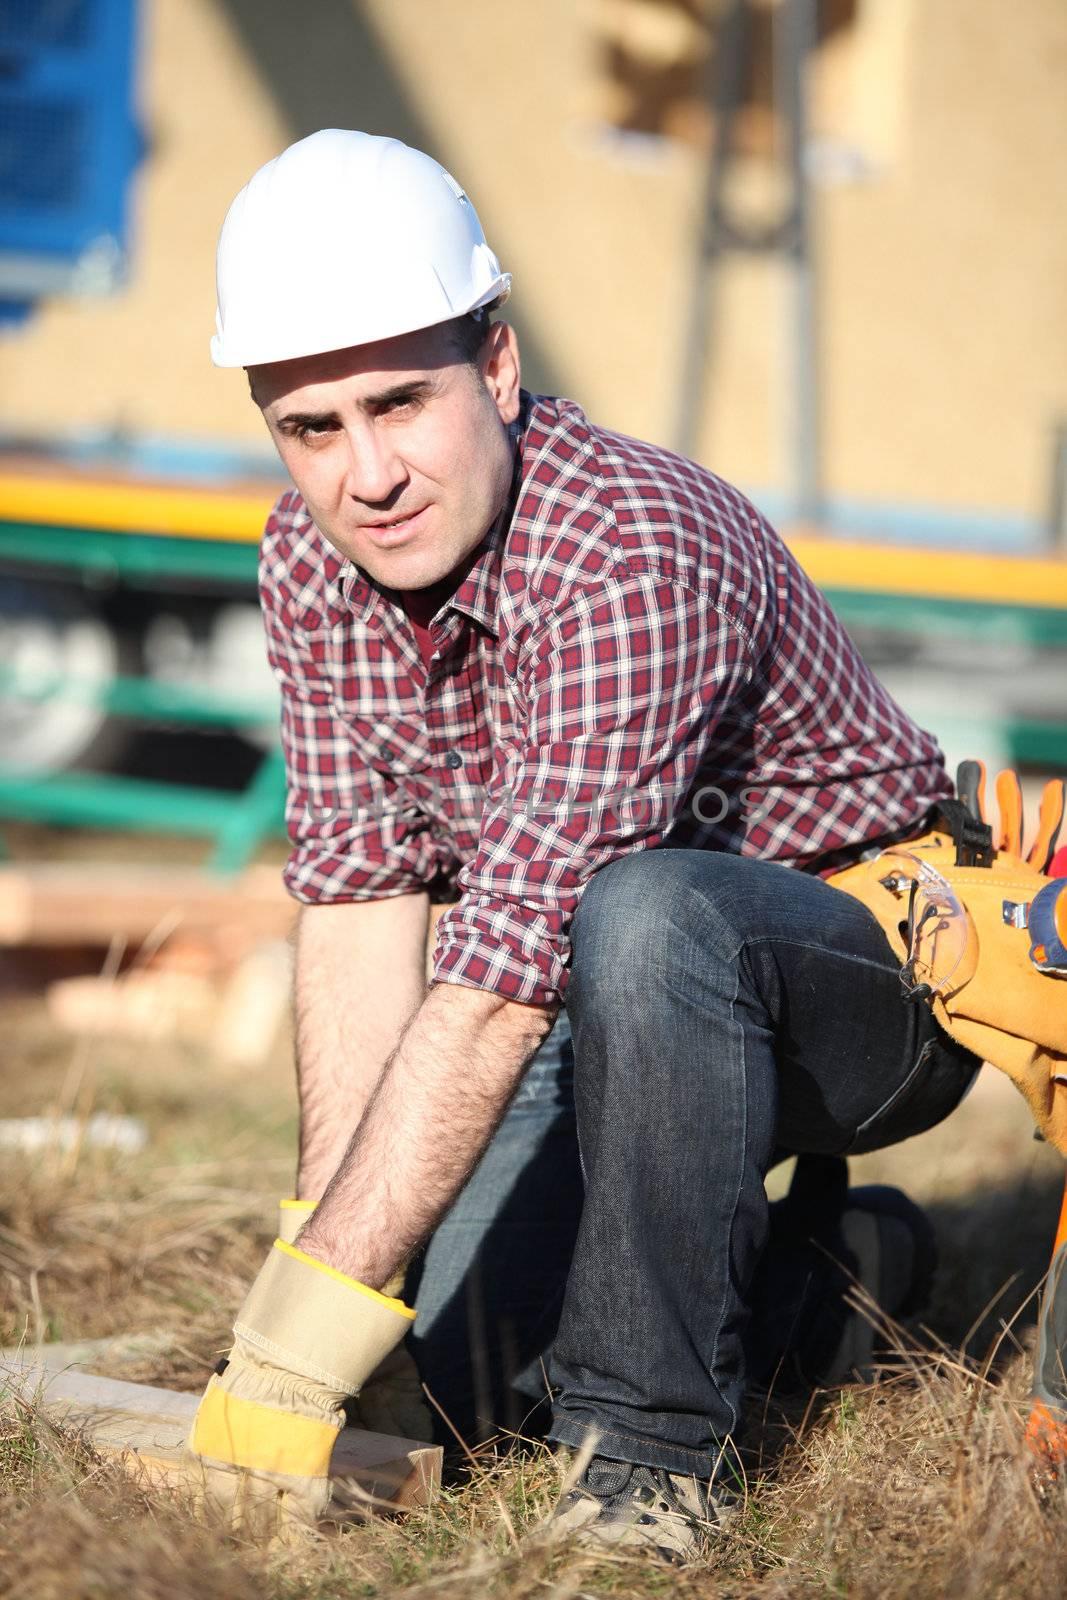 Builder outdoors